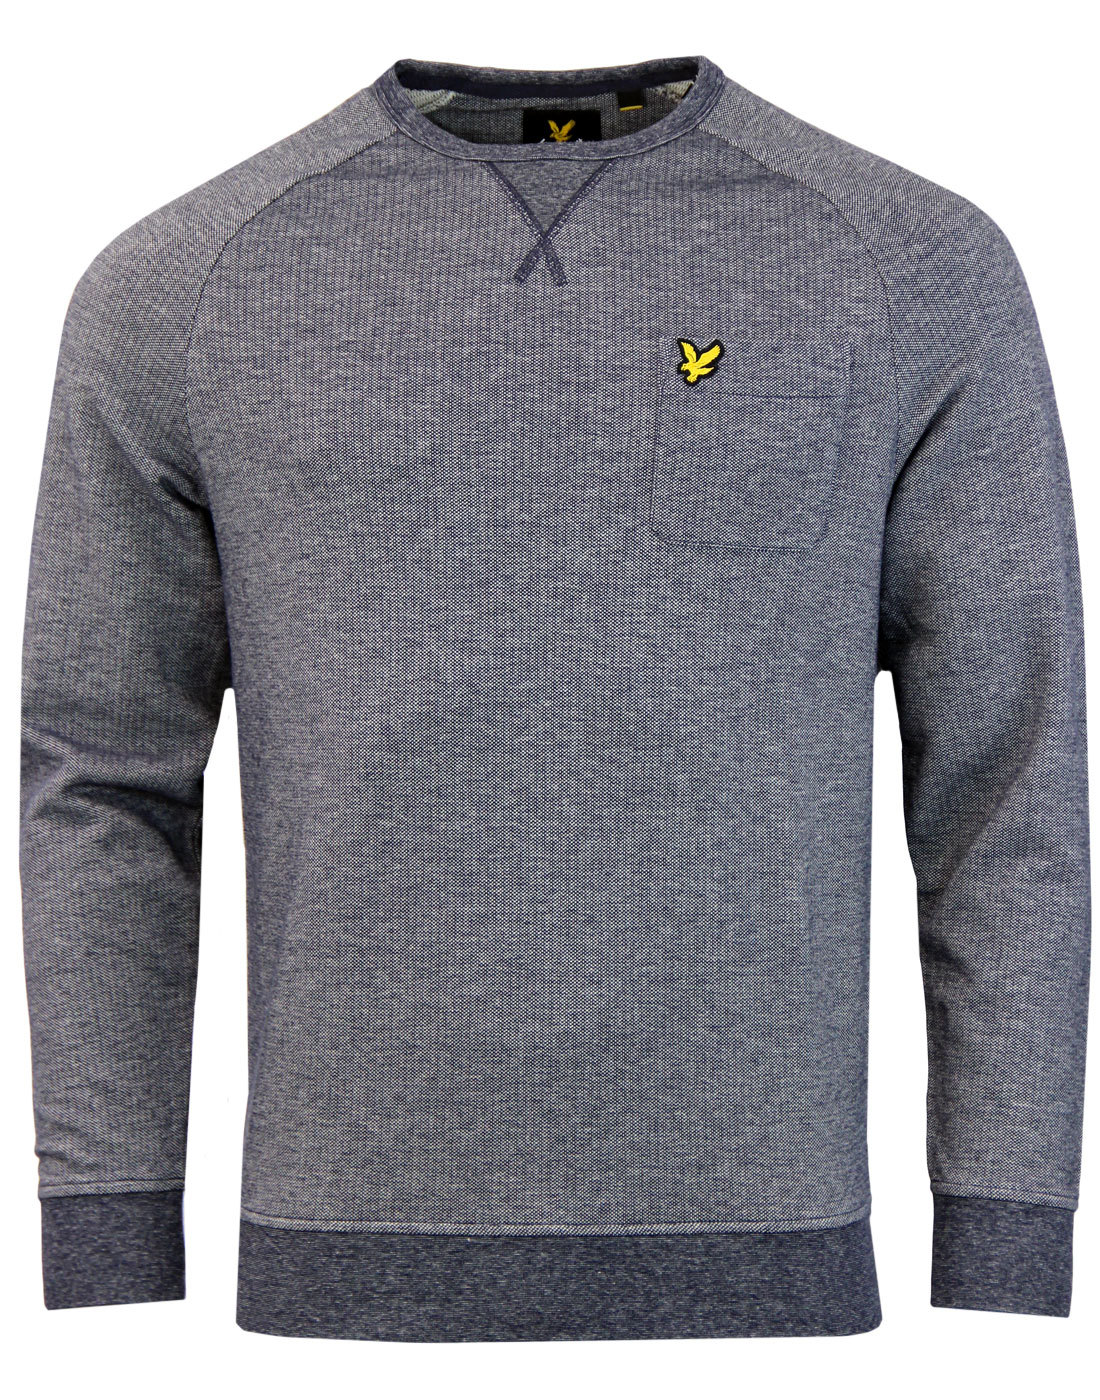 LYLE & SCOTT Retro 1970s Oxford Stripe Sweatshirt